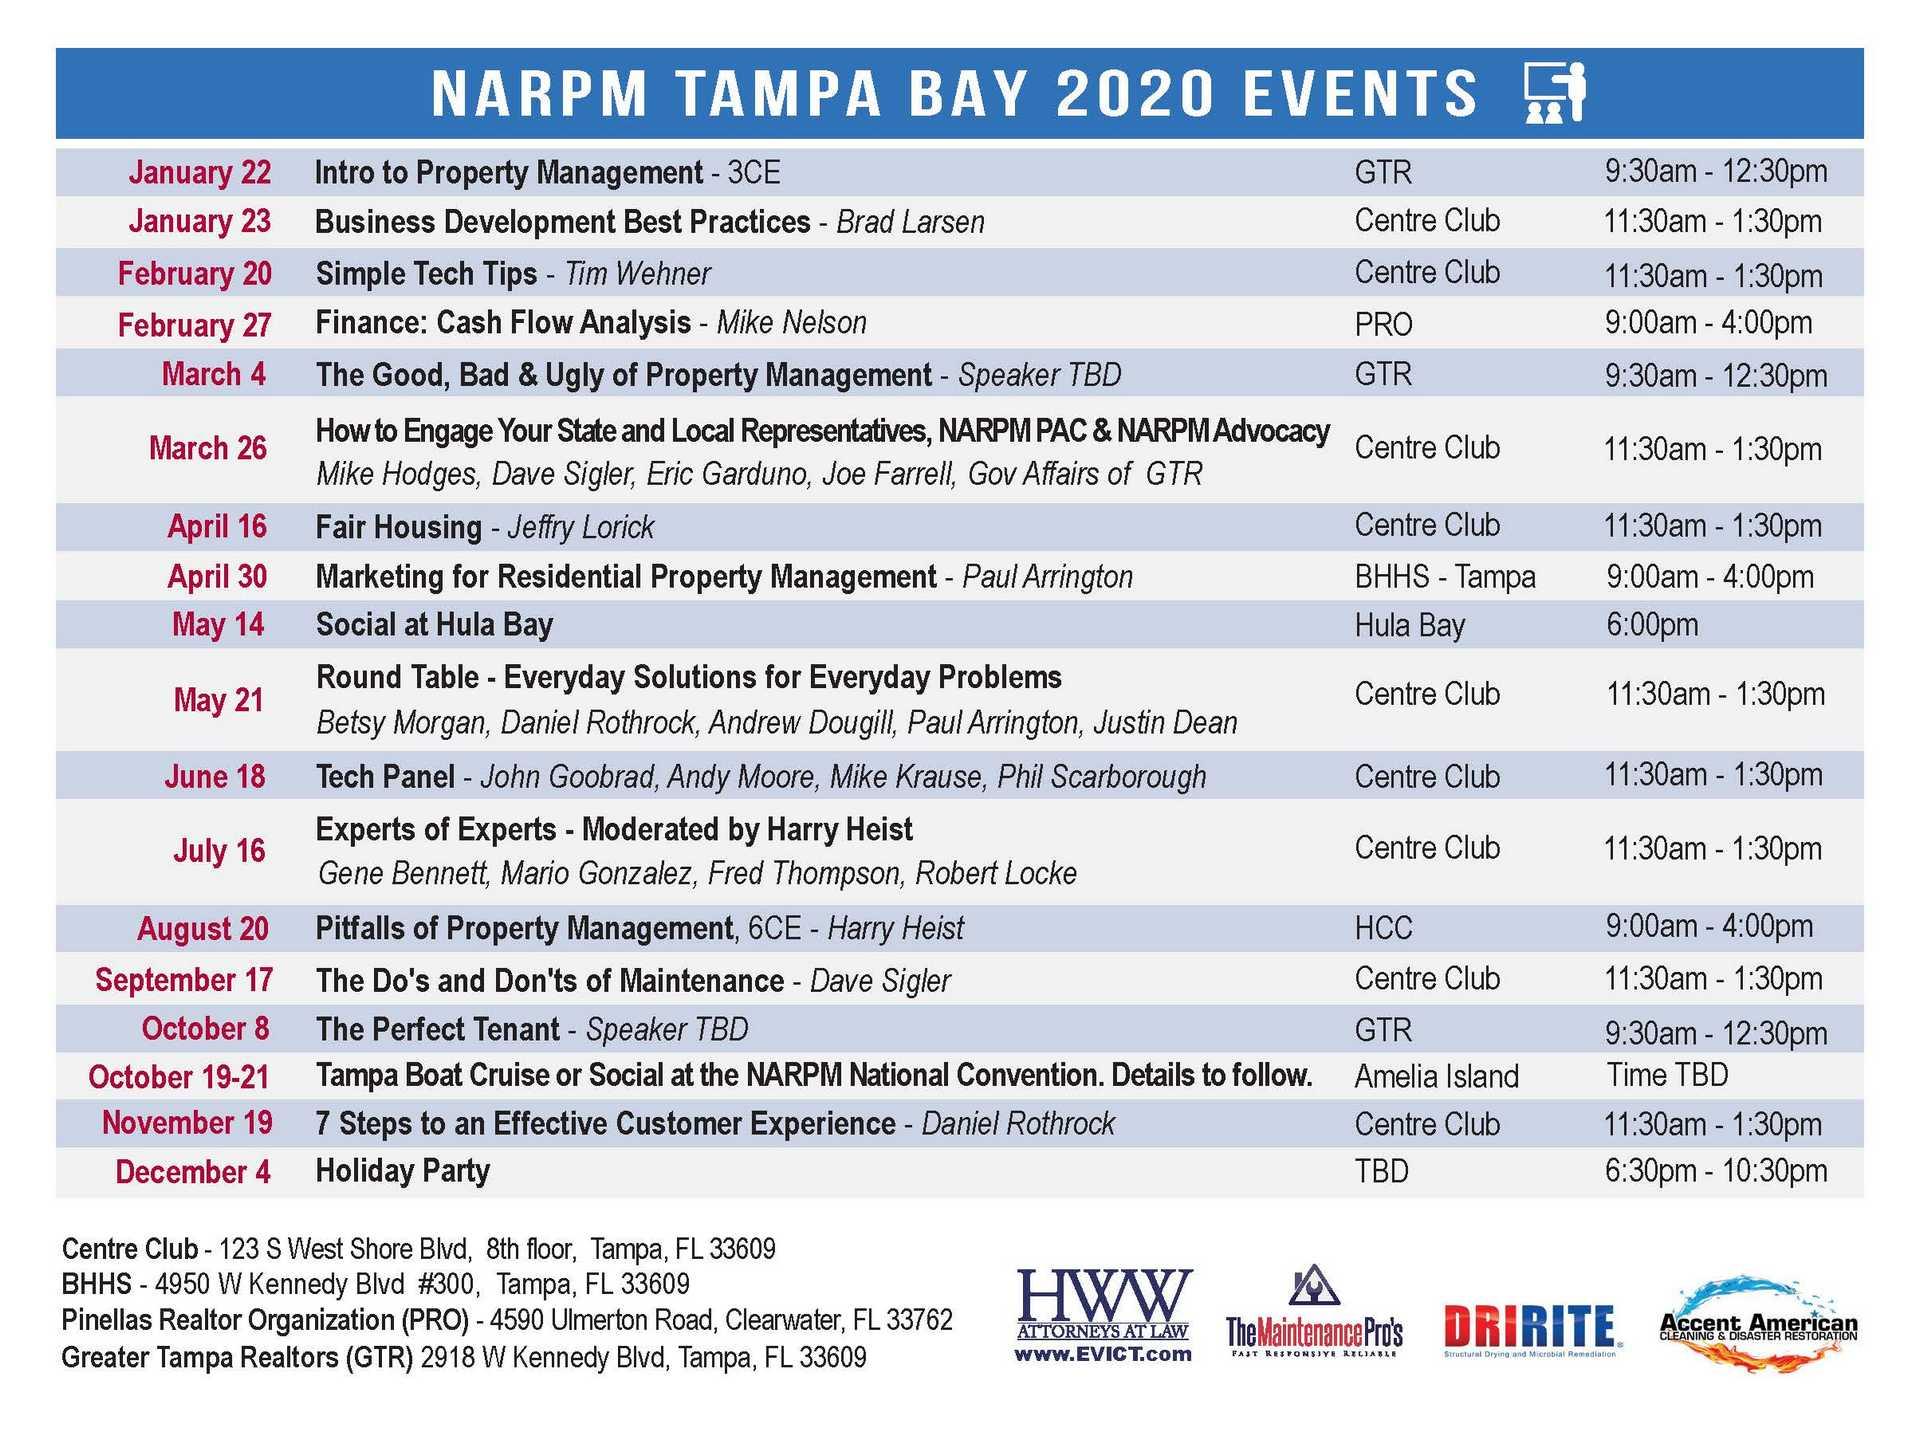 narpm tampa 2020 event postcard